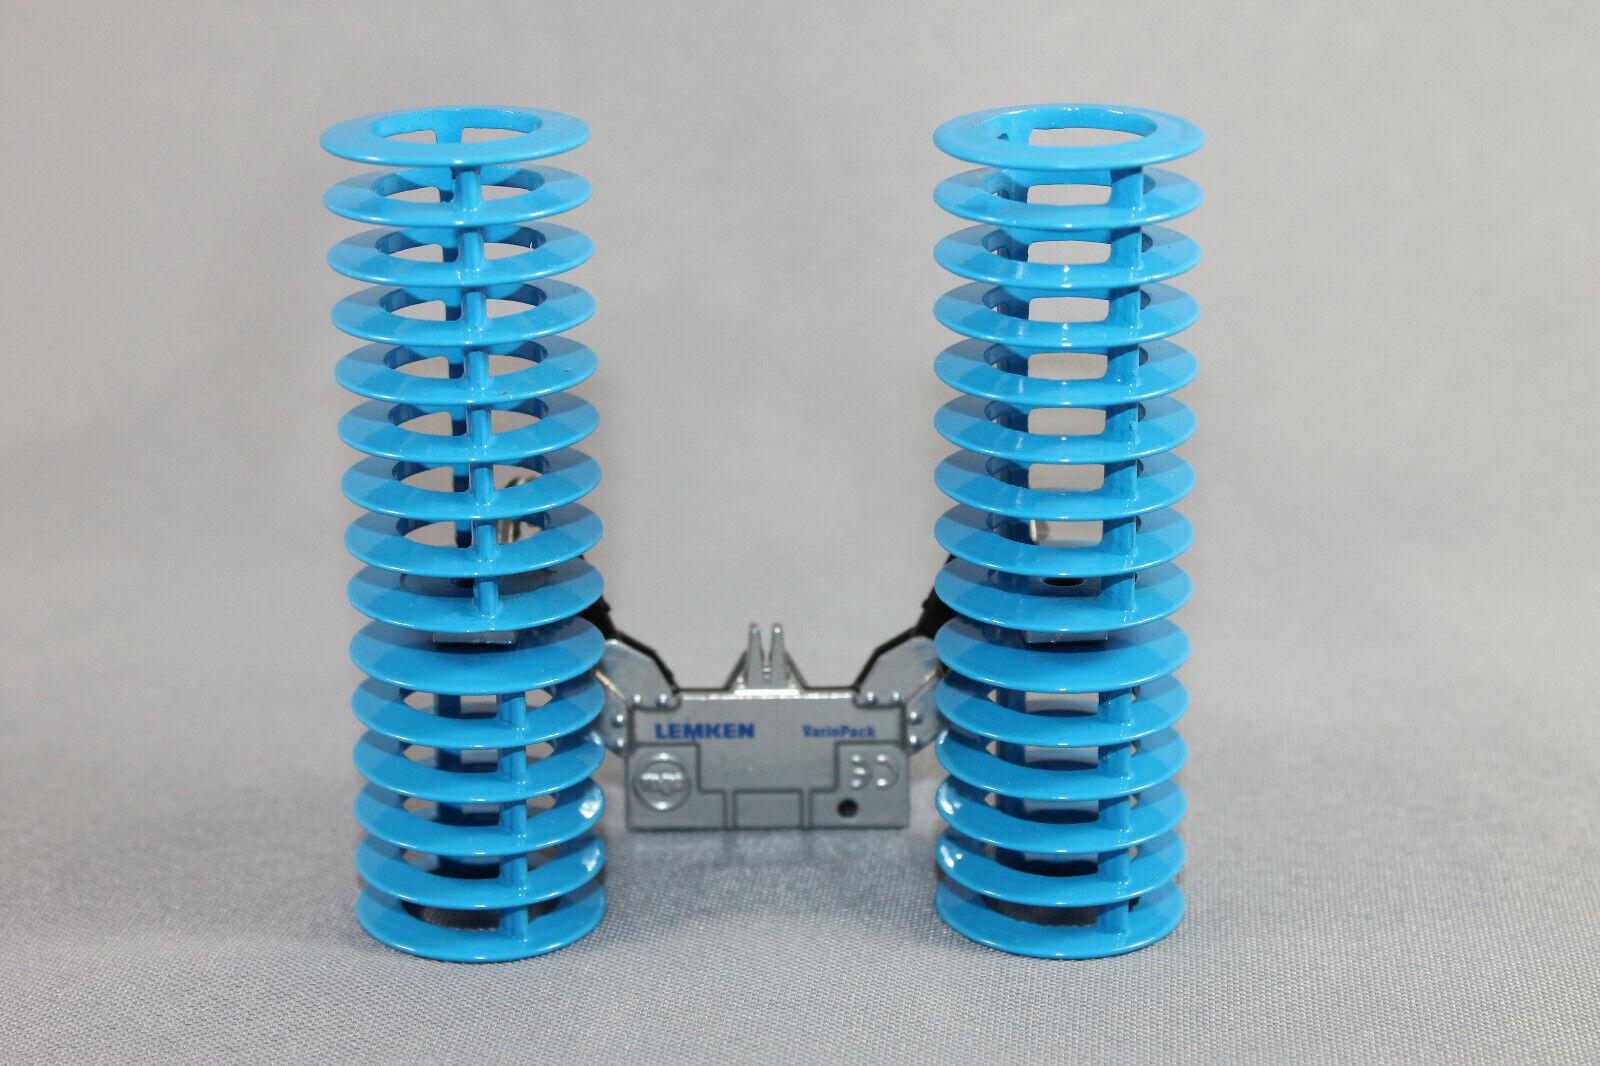 Siku 2051 Volldrehpflug blau//silber Maßstab 1:32 NEU!°